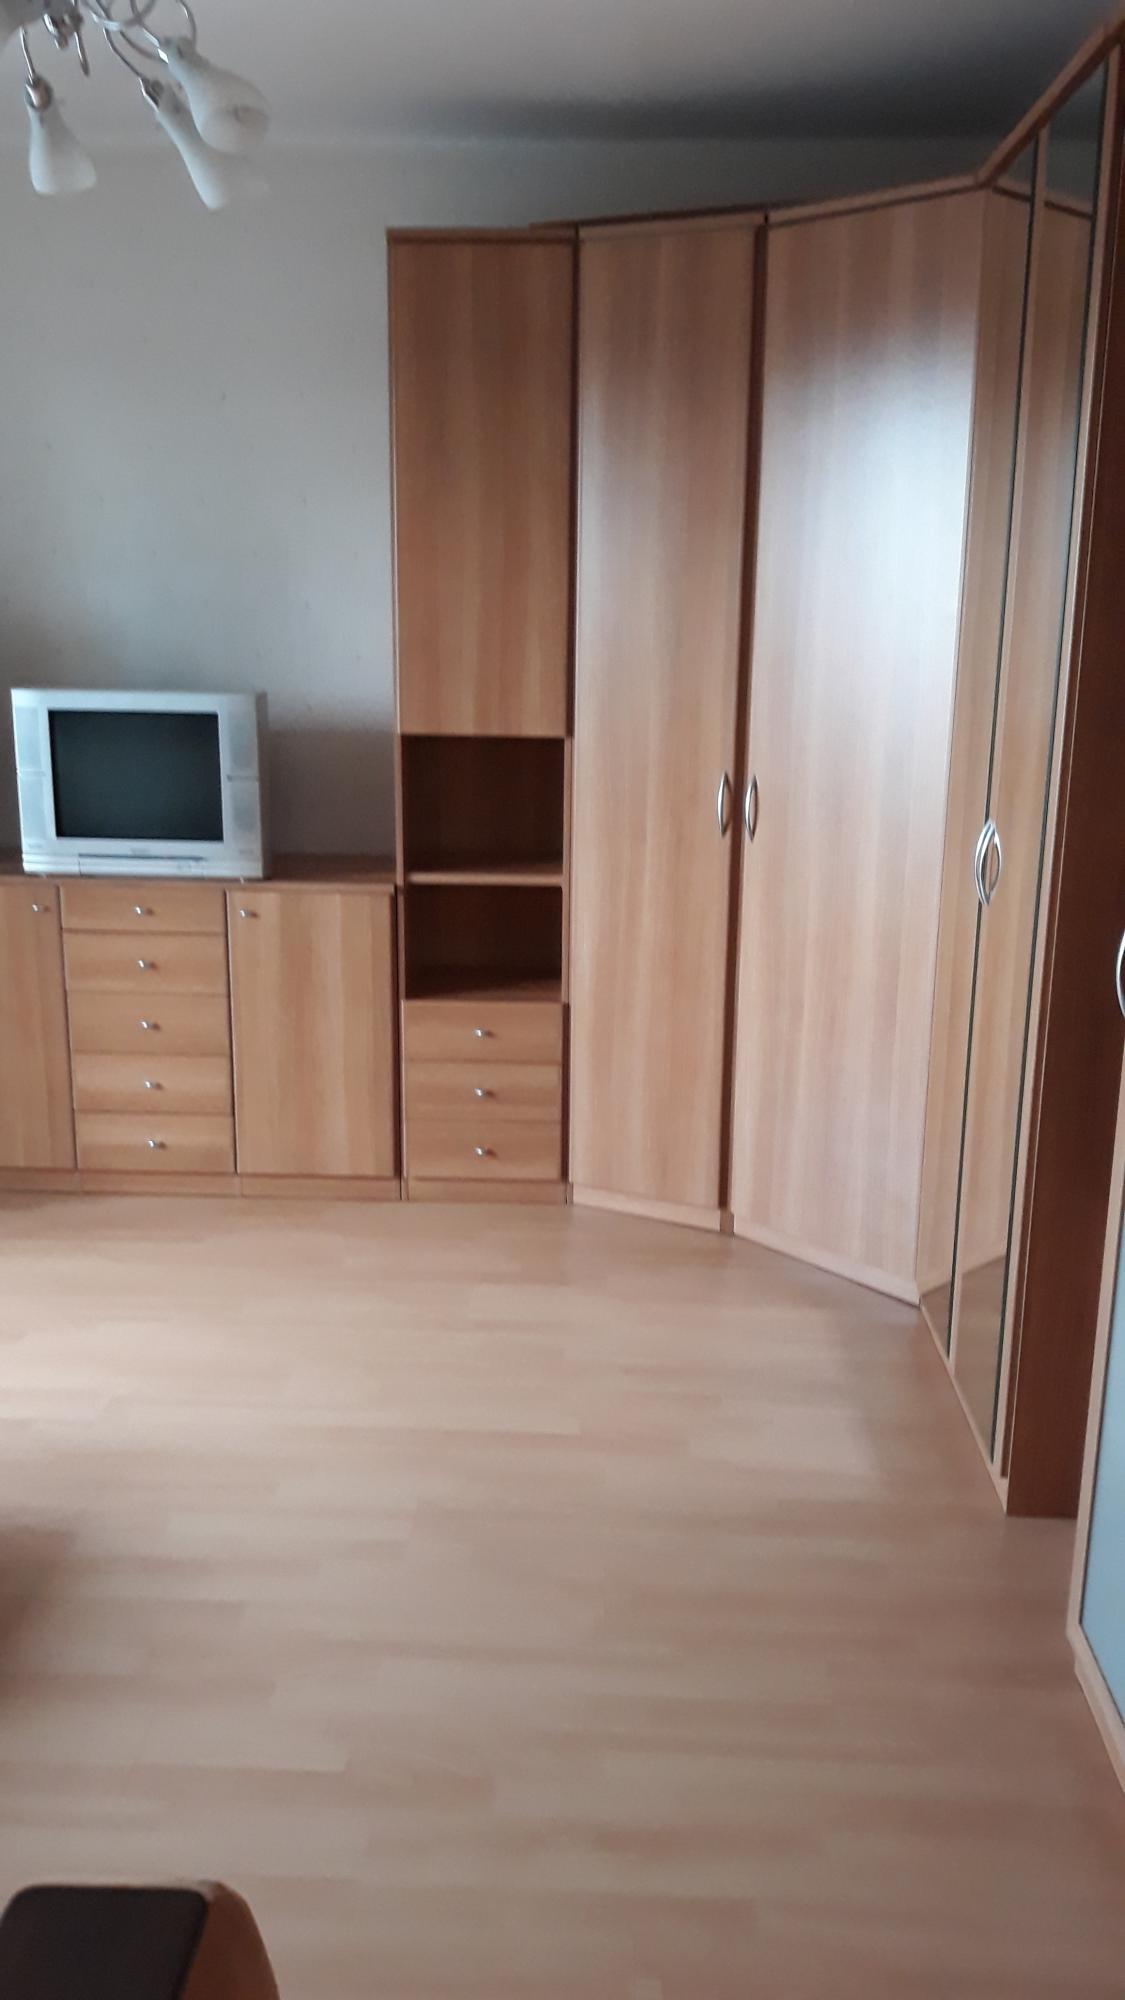 1к квартира улица Урицкого, 115 | 20000 | аренда в Красноярске фото 1